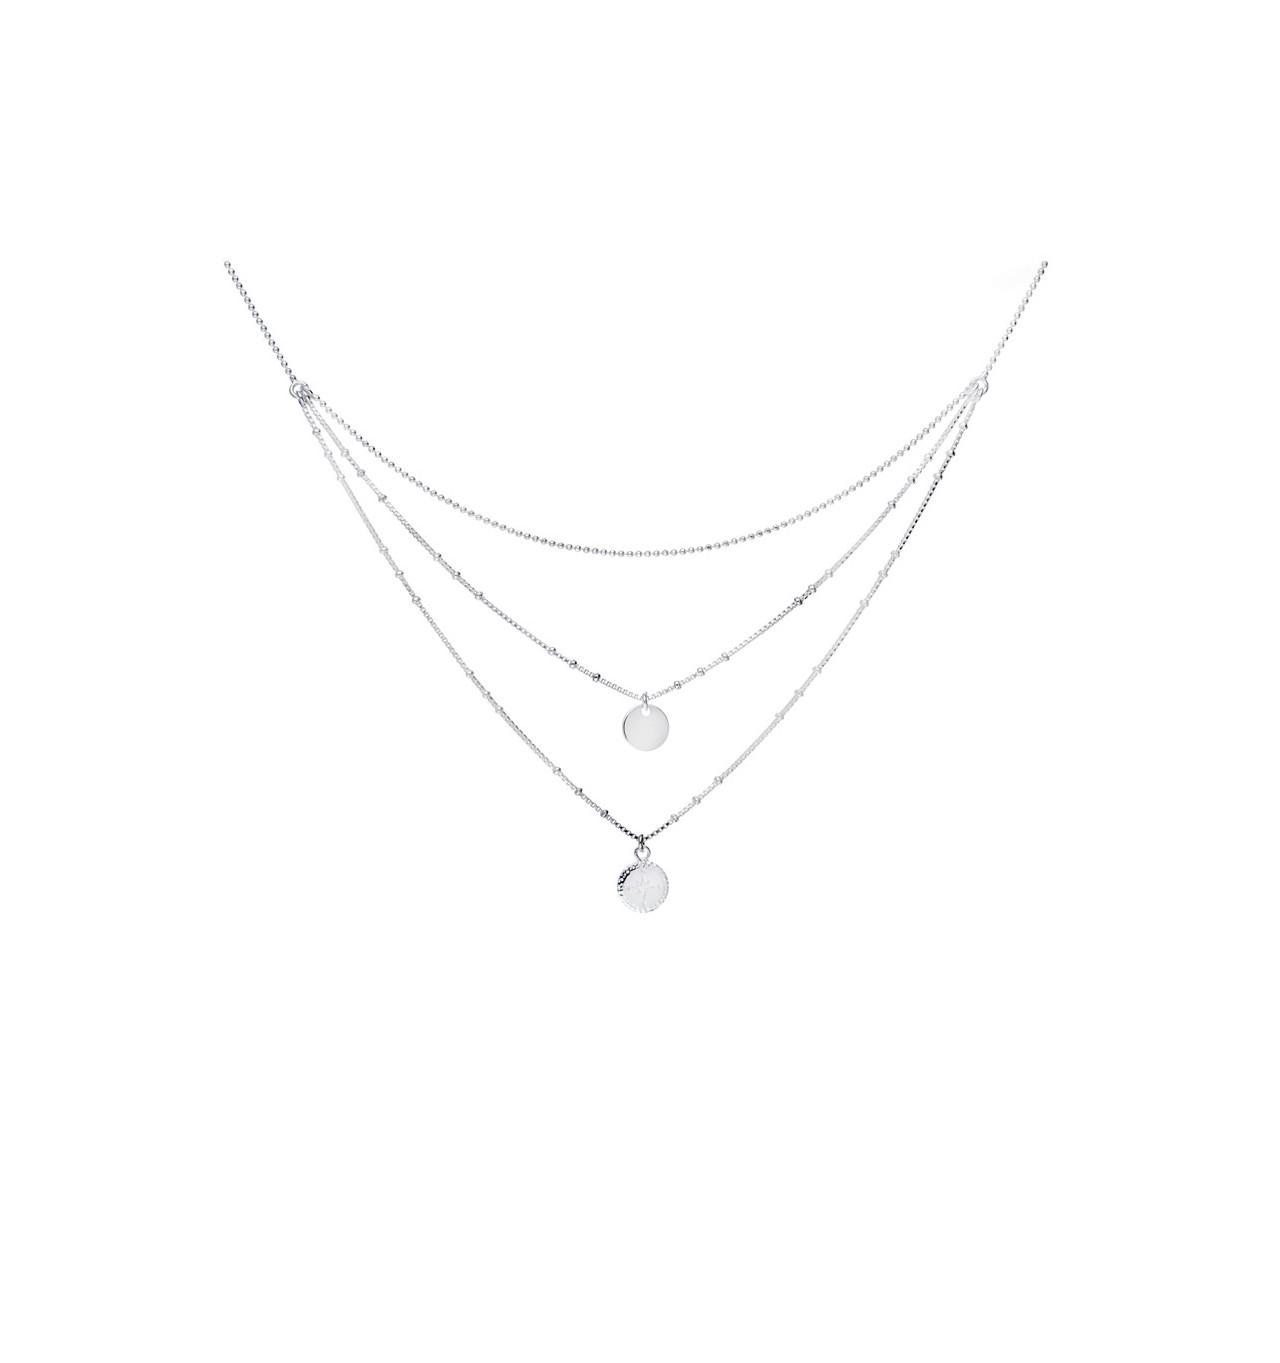 doriane-Argent 925-collier-triple rangs-bijoux totem.